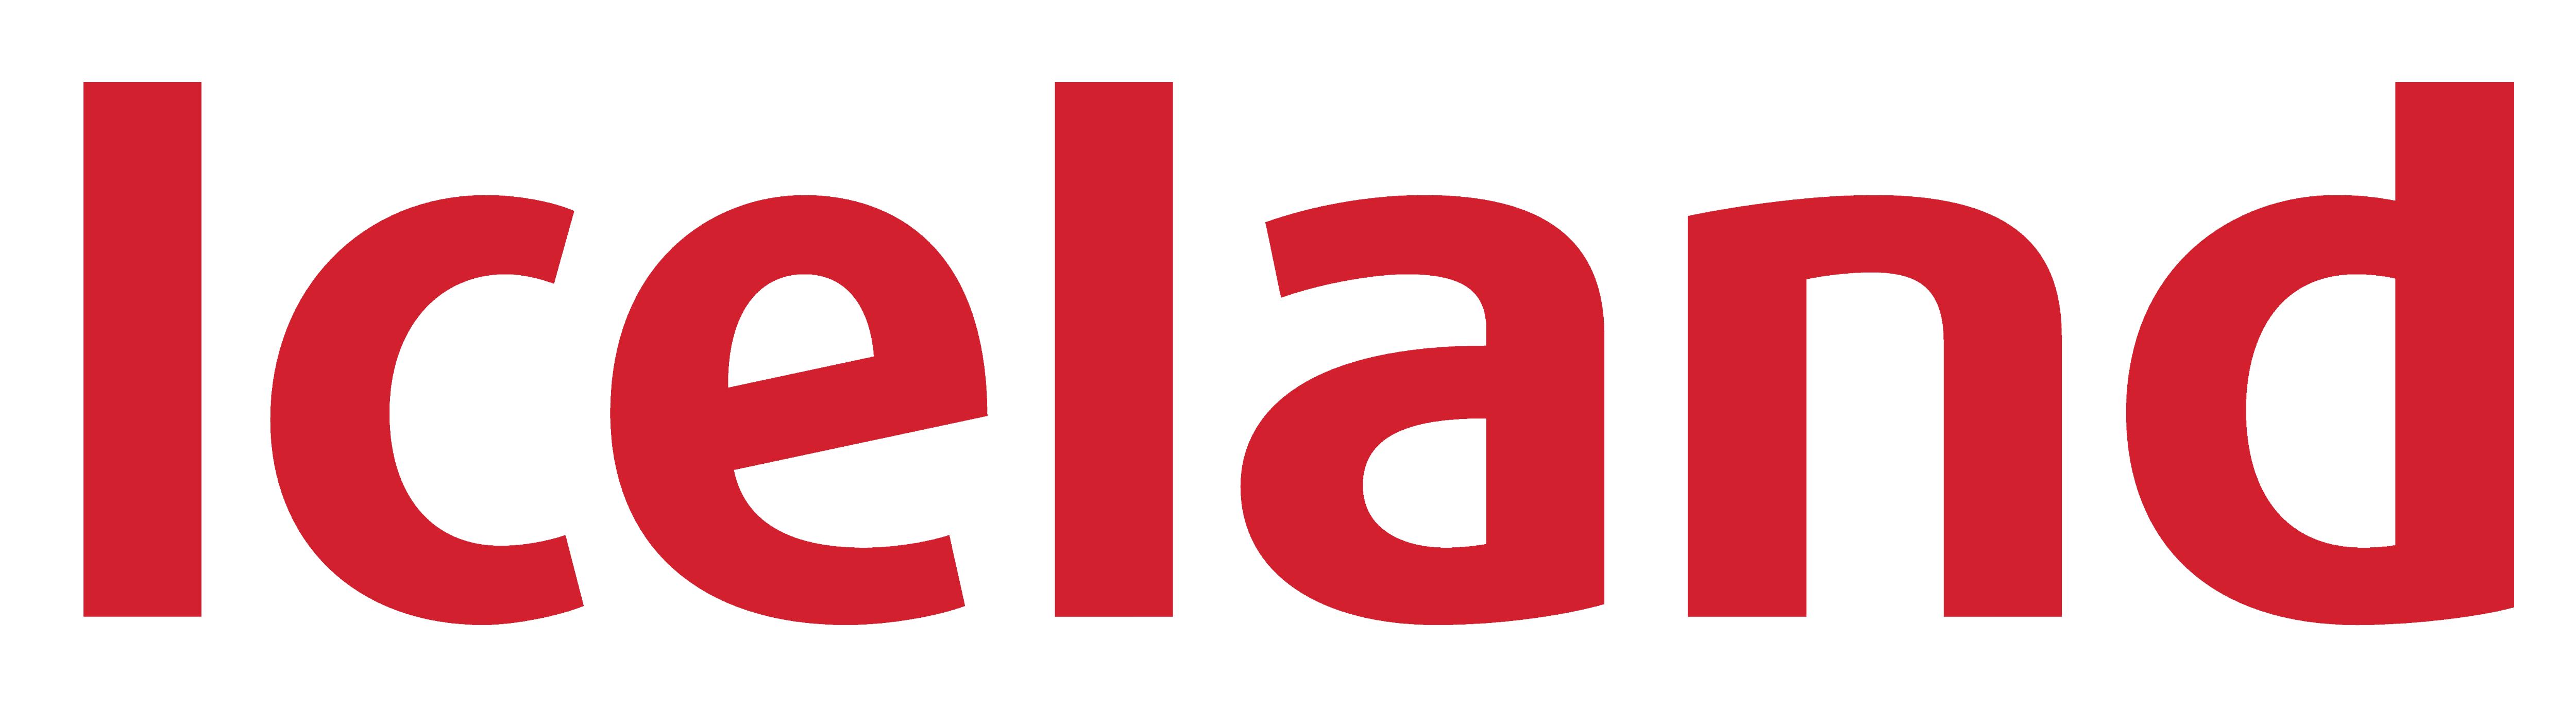 Rouse's supermarket logo download